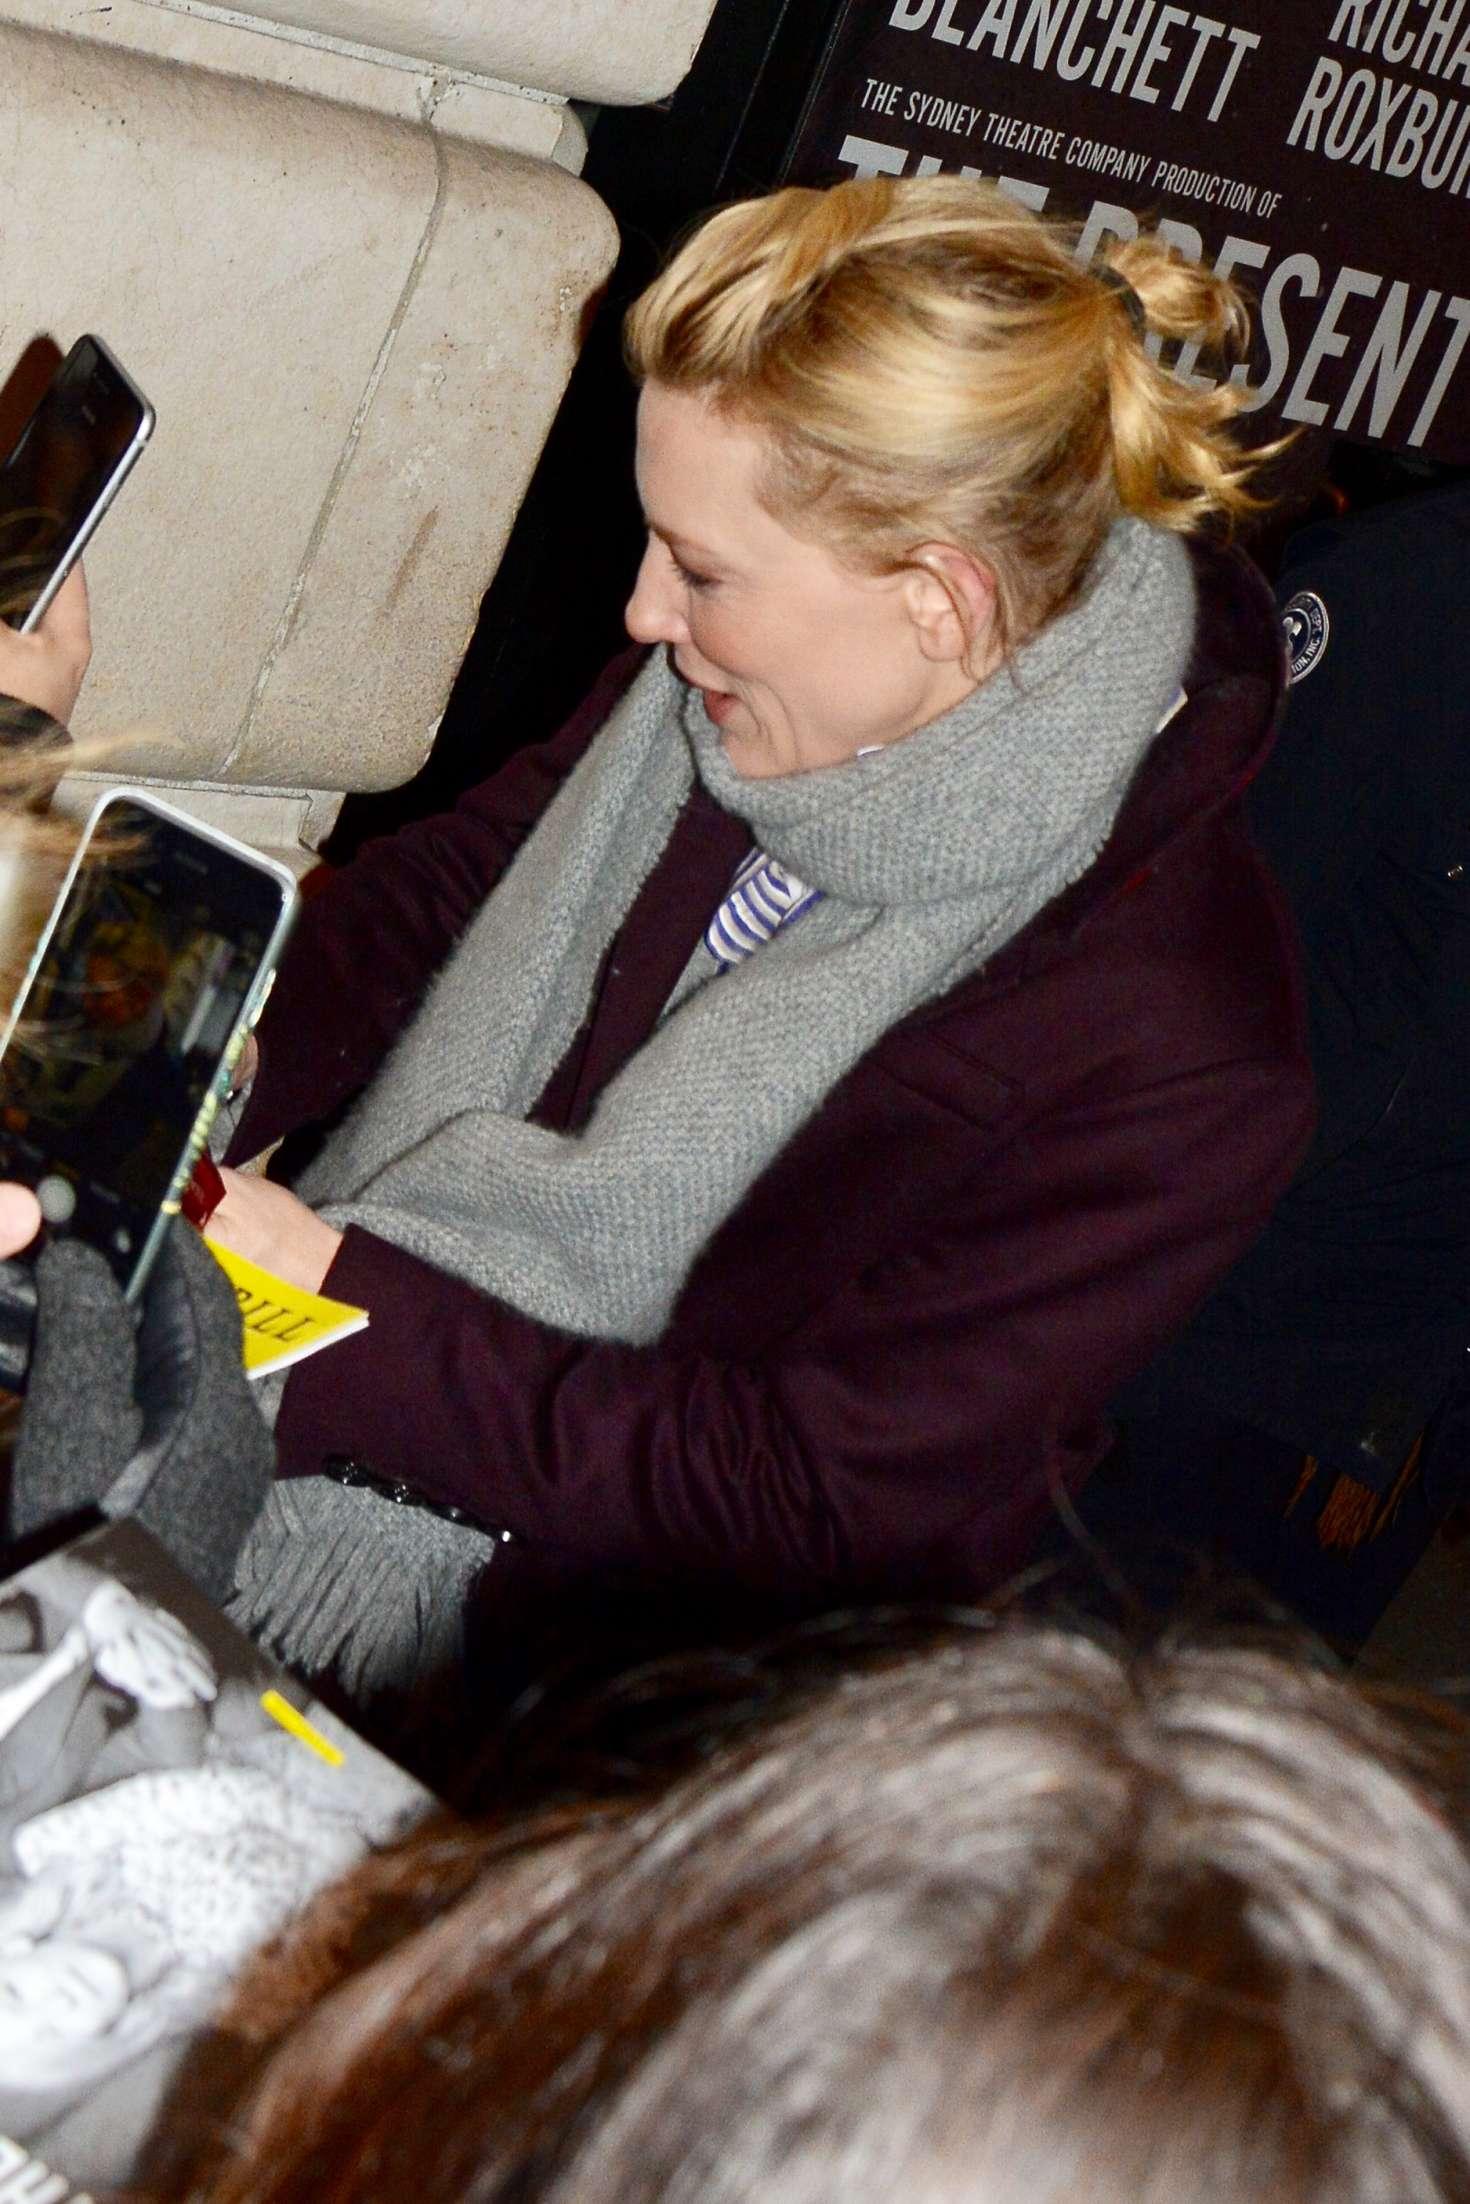 Cate Blanchett 2017 : Cate Blanchett: Meets fans after her broadway performance -01